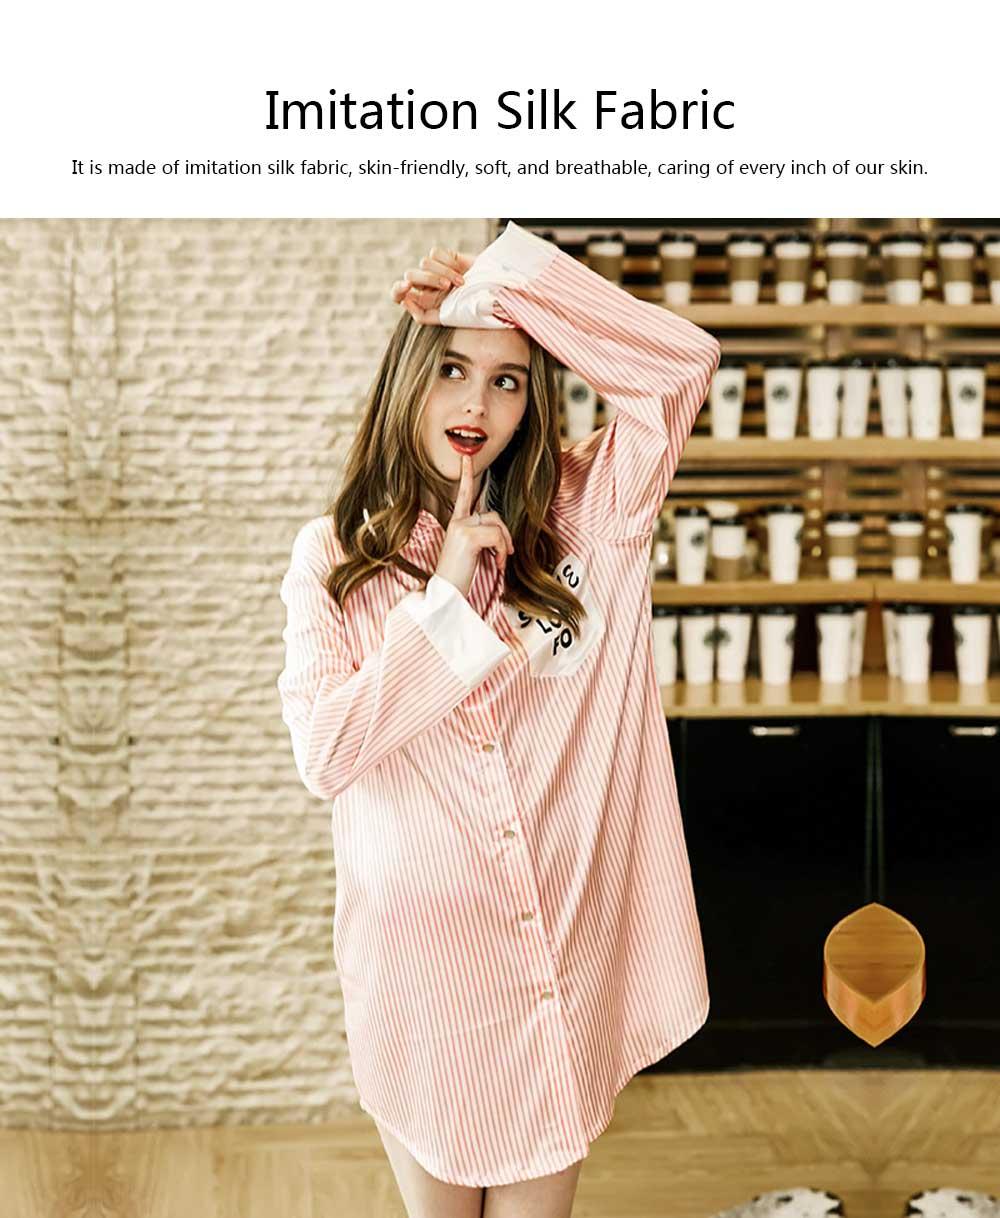 Girls Shirt-style Cardigan Pajamas, Long-Sleeved Imitation Silk Fabric Striped Tracksuit 3